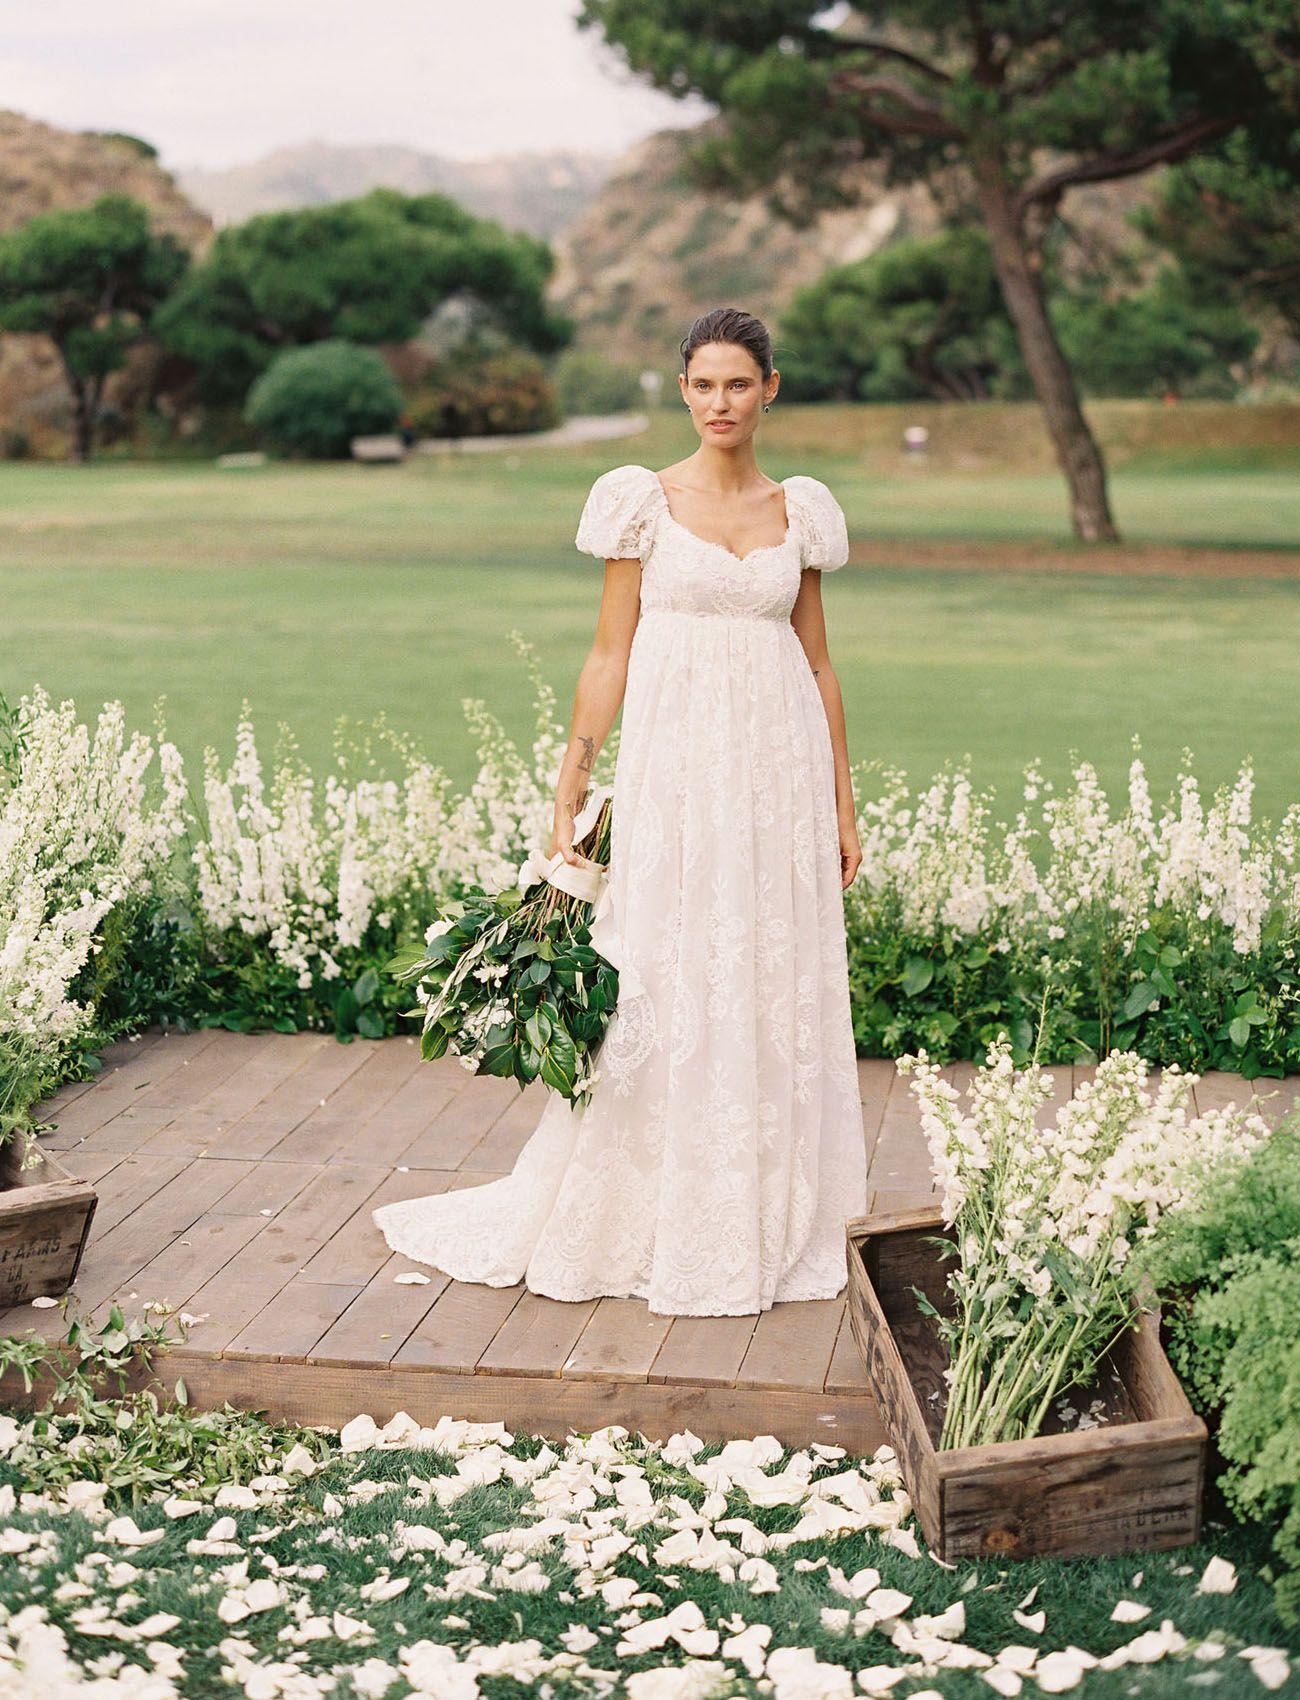 This Supermodel Had The Dreamiest Italian Wedding In Orange County California Green Wedding Shoes Elegant Wedding Gowns Italian Wedding Cheap Lace Wedding Dresses [ 1700 x 1300 Pixel ]